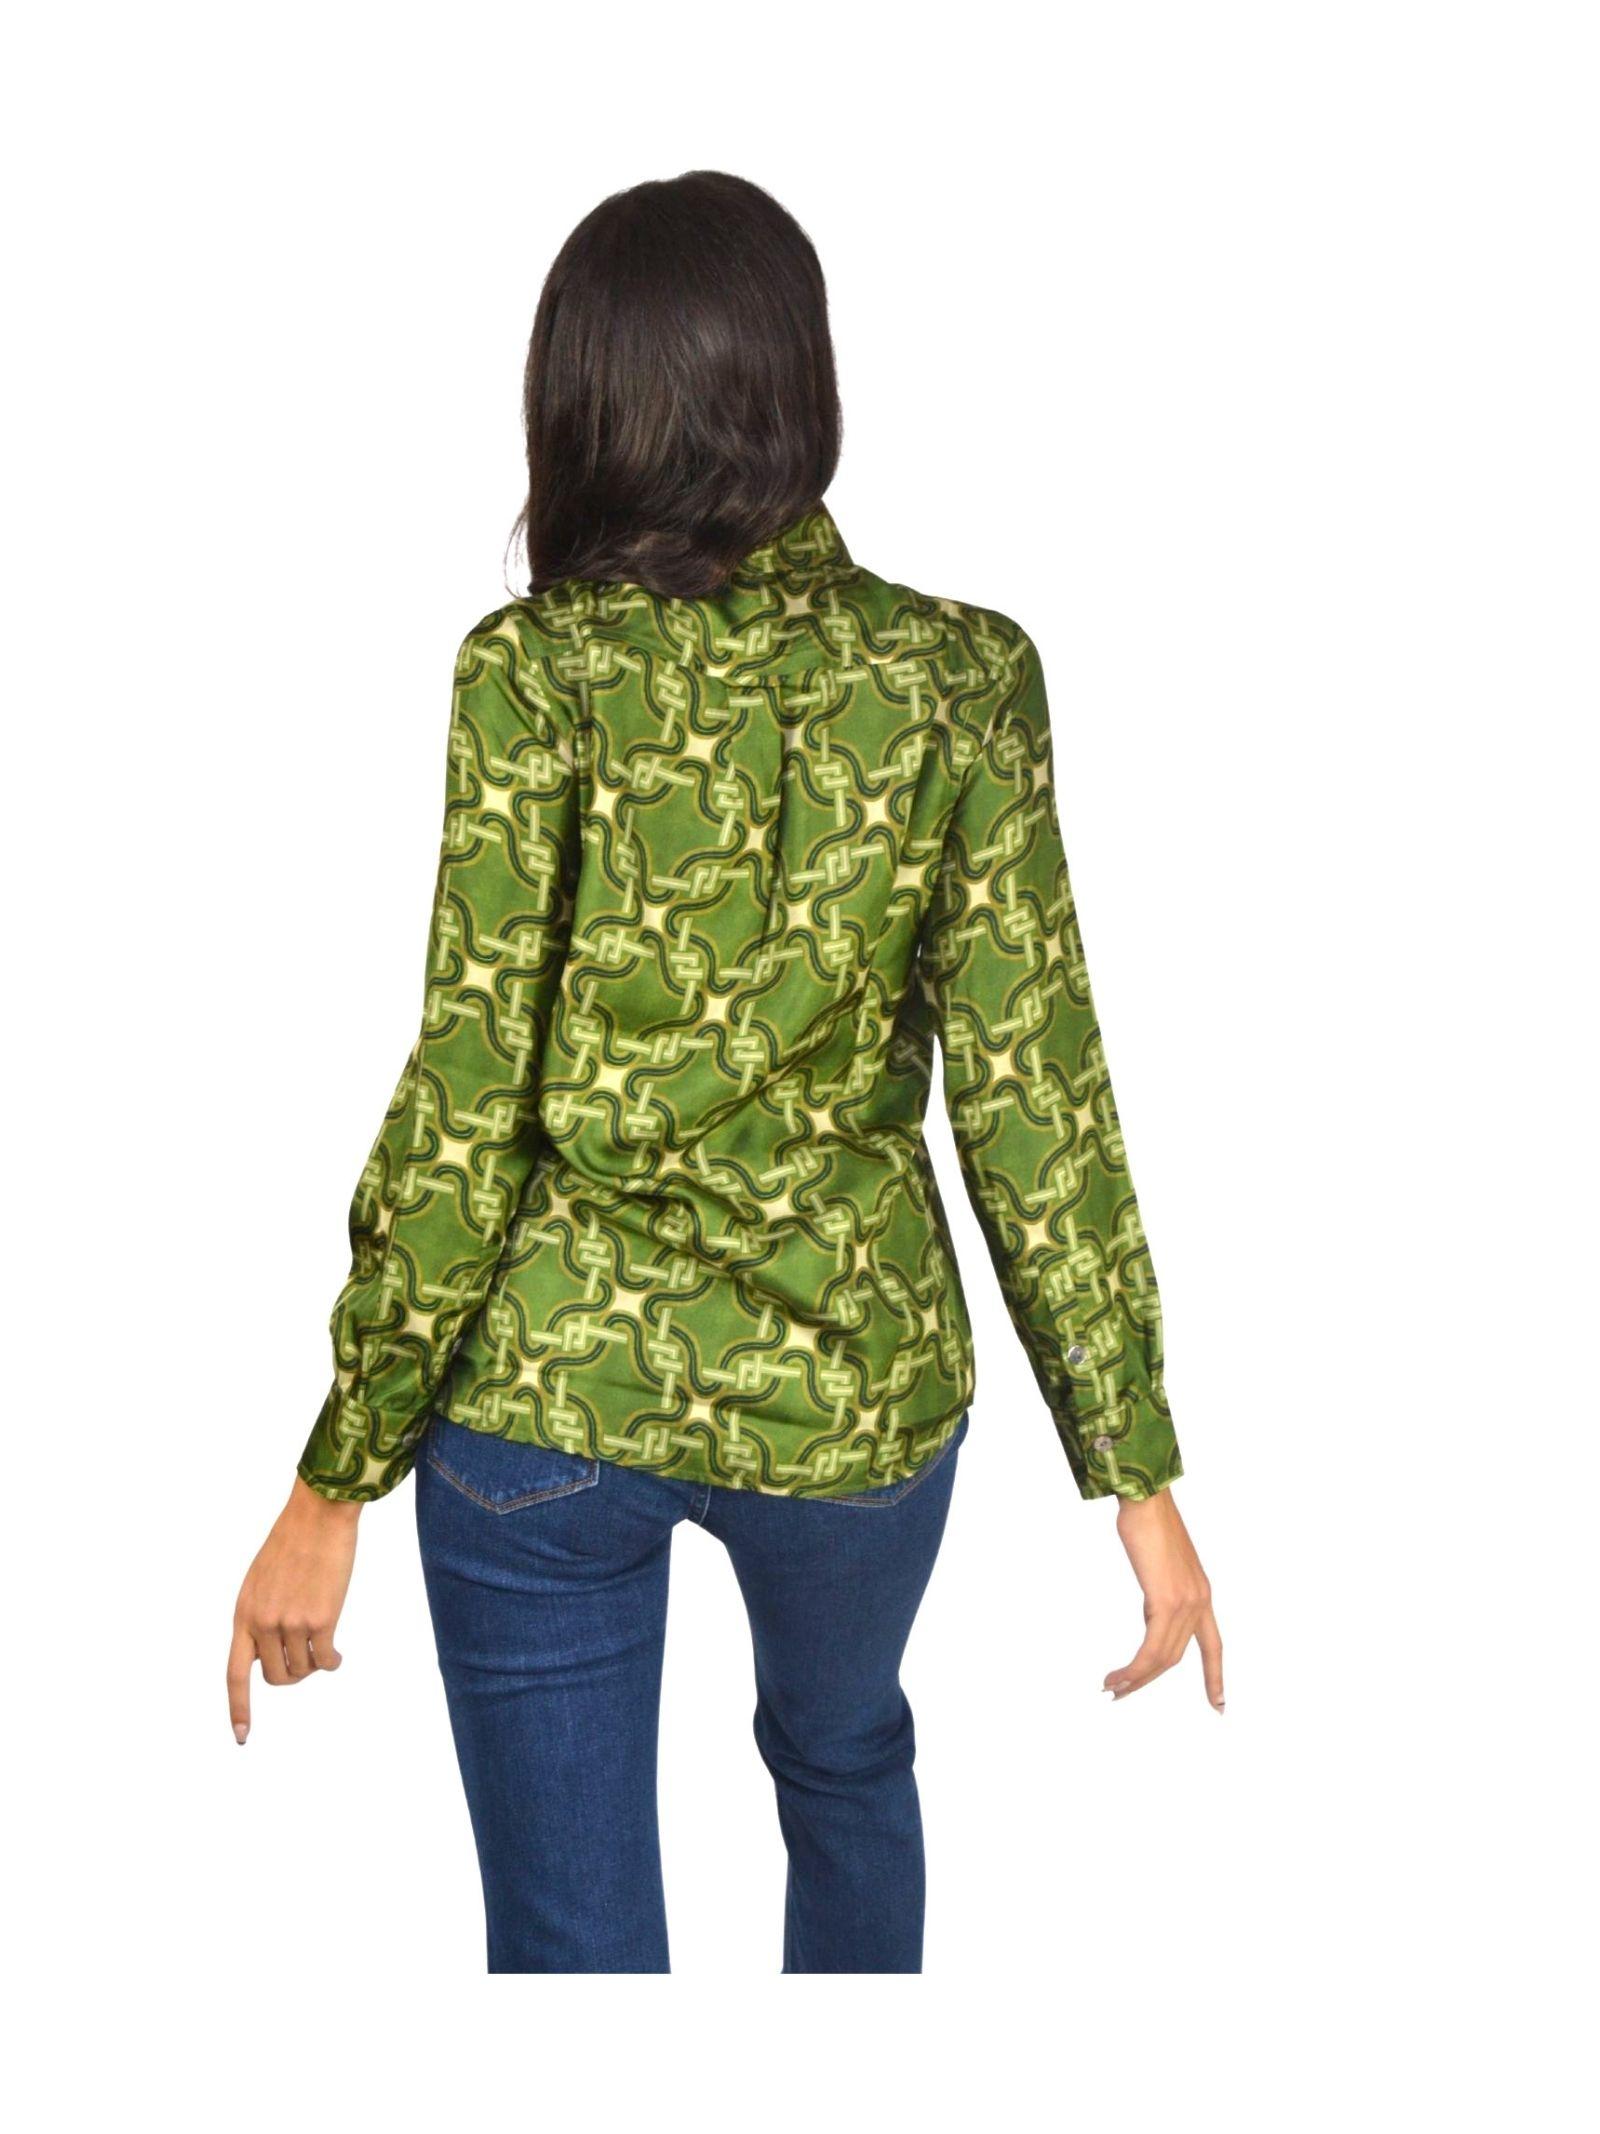 Women's Green Shirt Maliparmi   Shirts and tops   JM214430107B6092